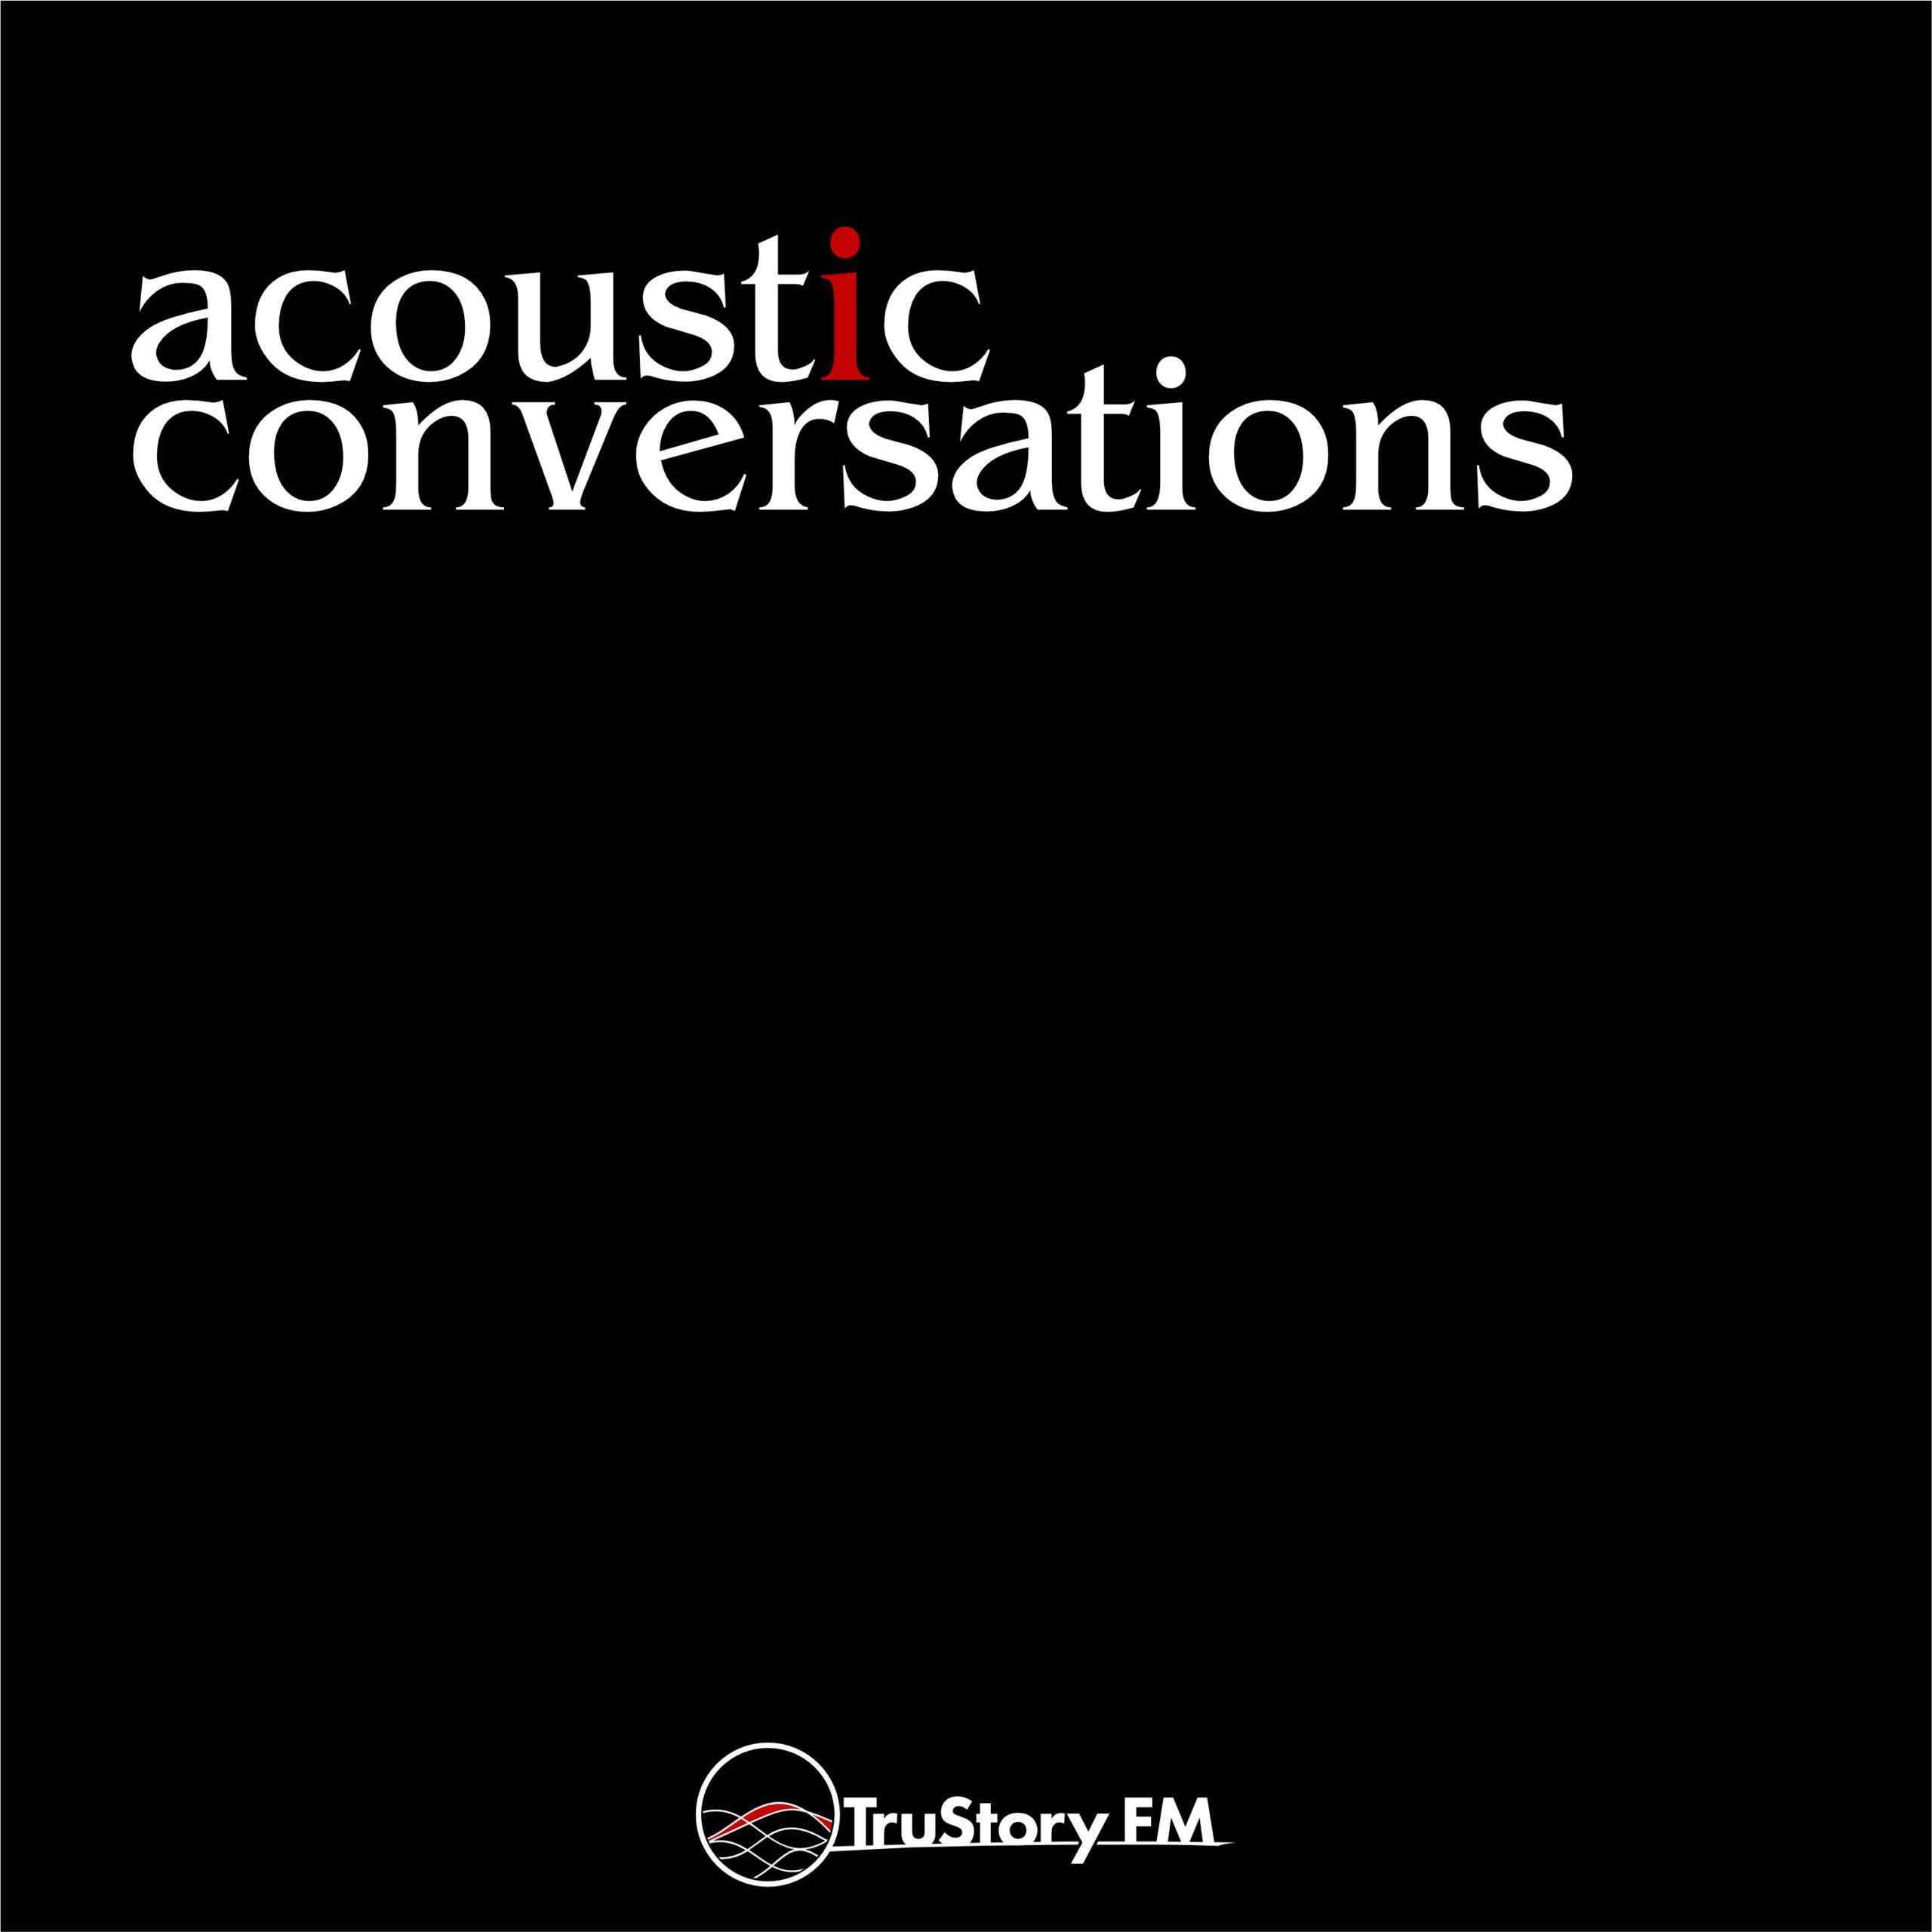 Accoustic Conversations